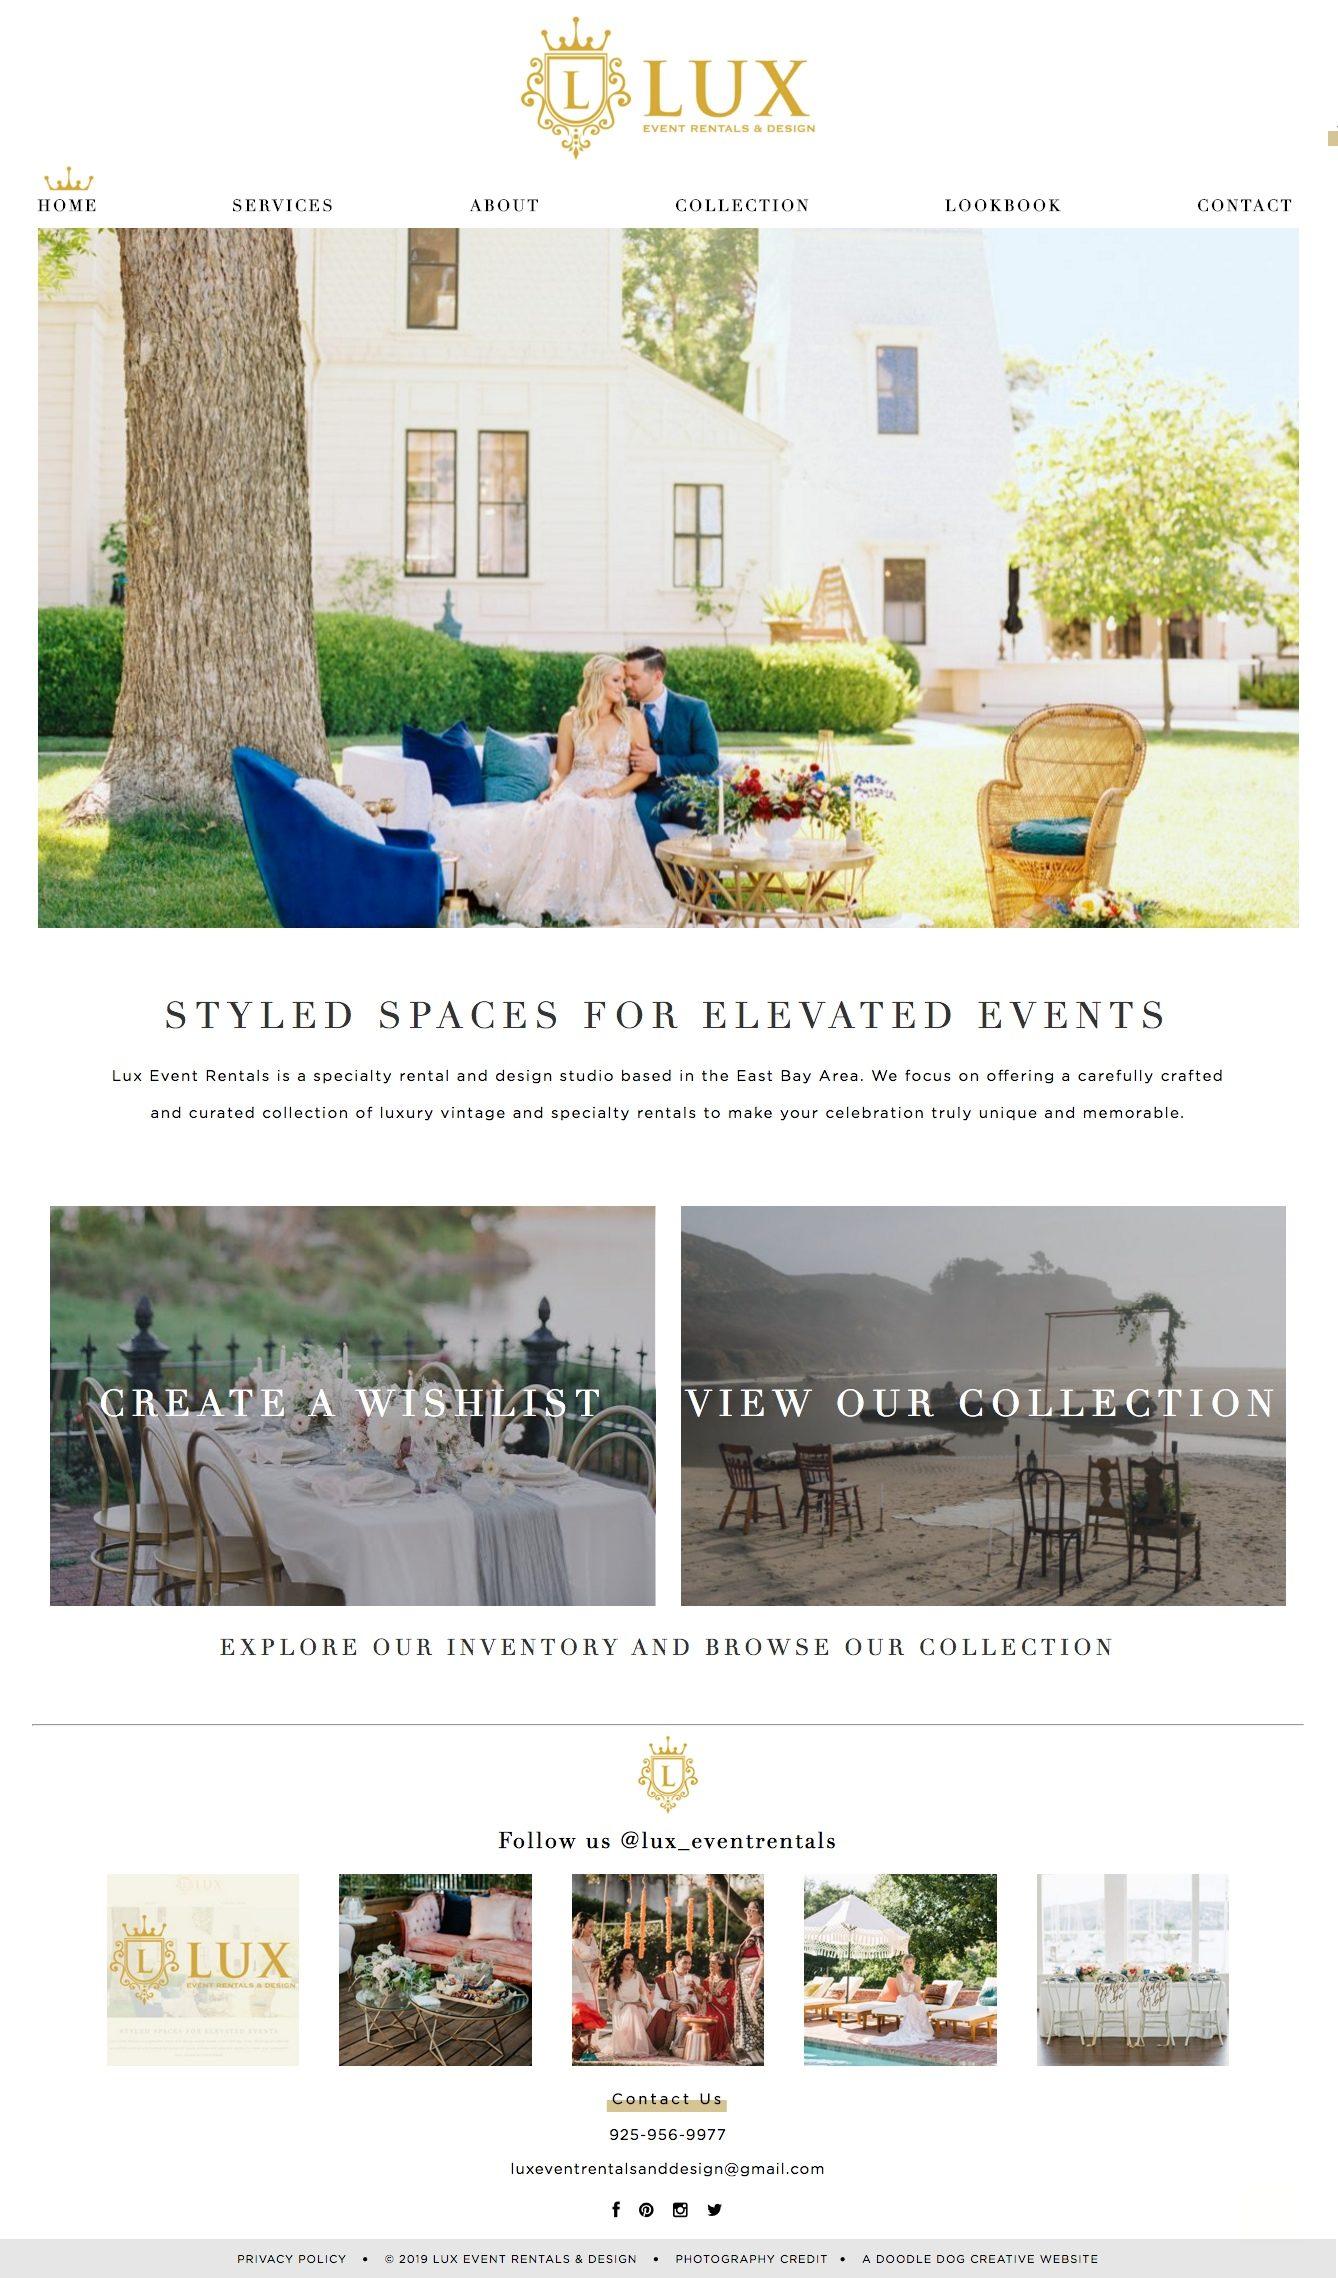 event rentals website design